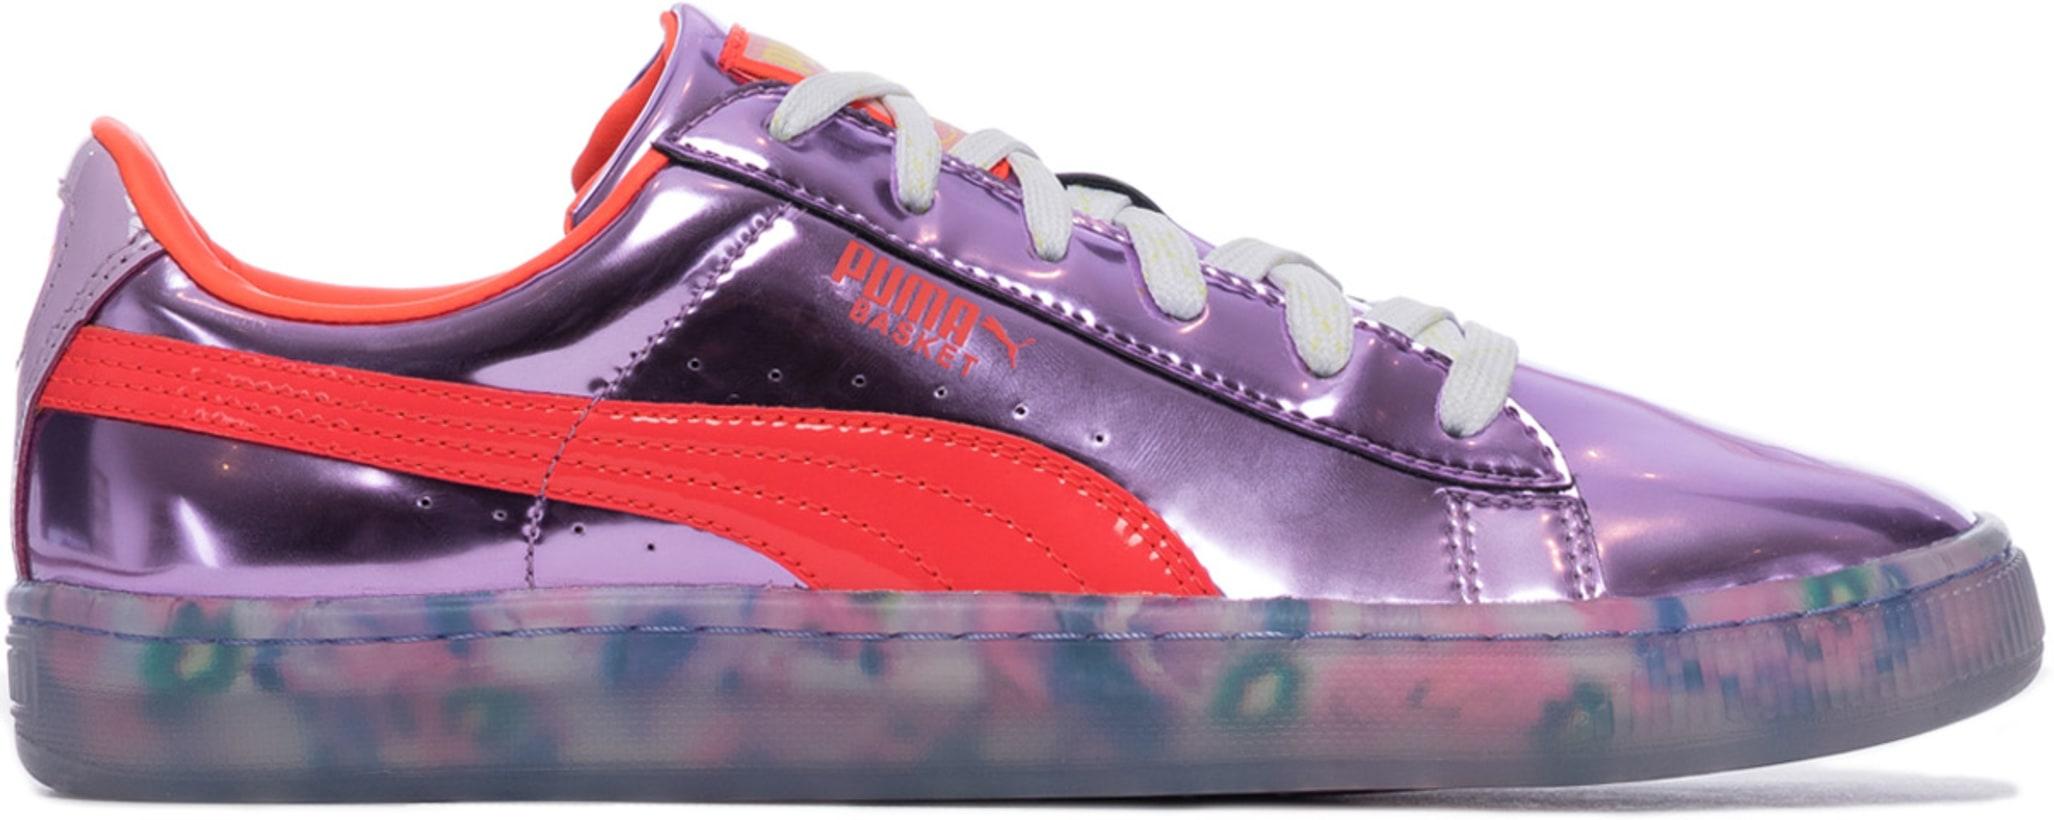 138a52dc38 Puma: Basket Candy Princess - Metallic Pink/Fiery Coral | influenceu